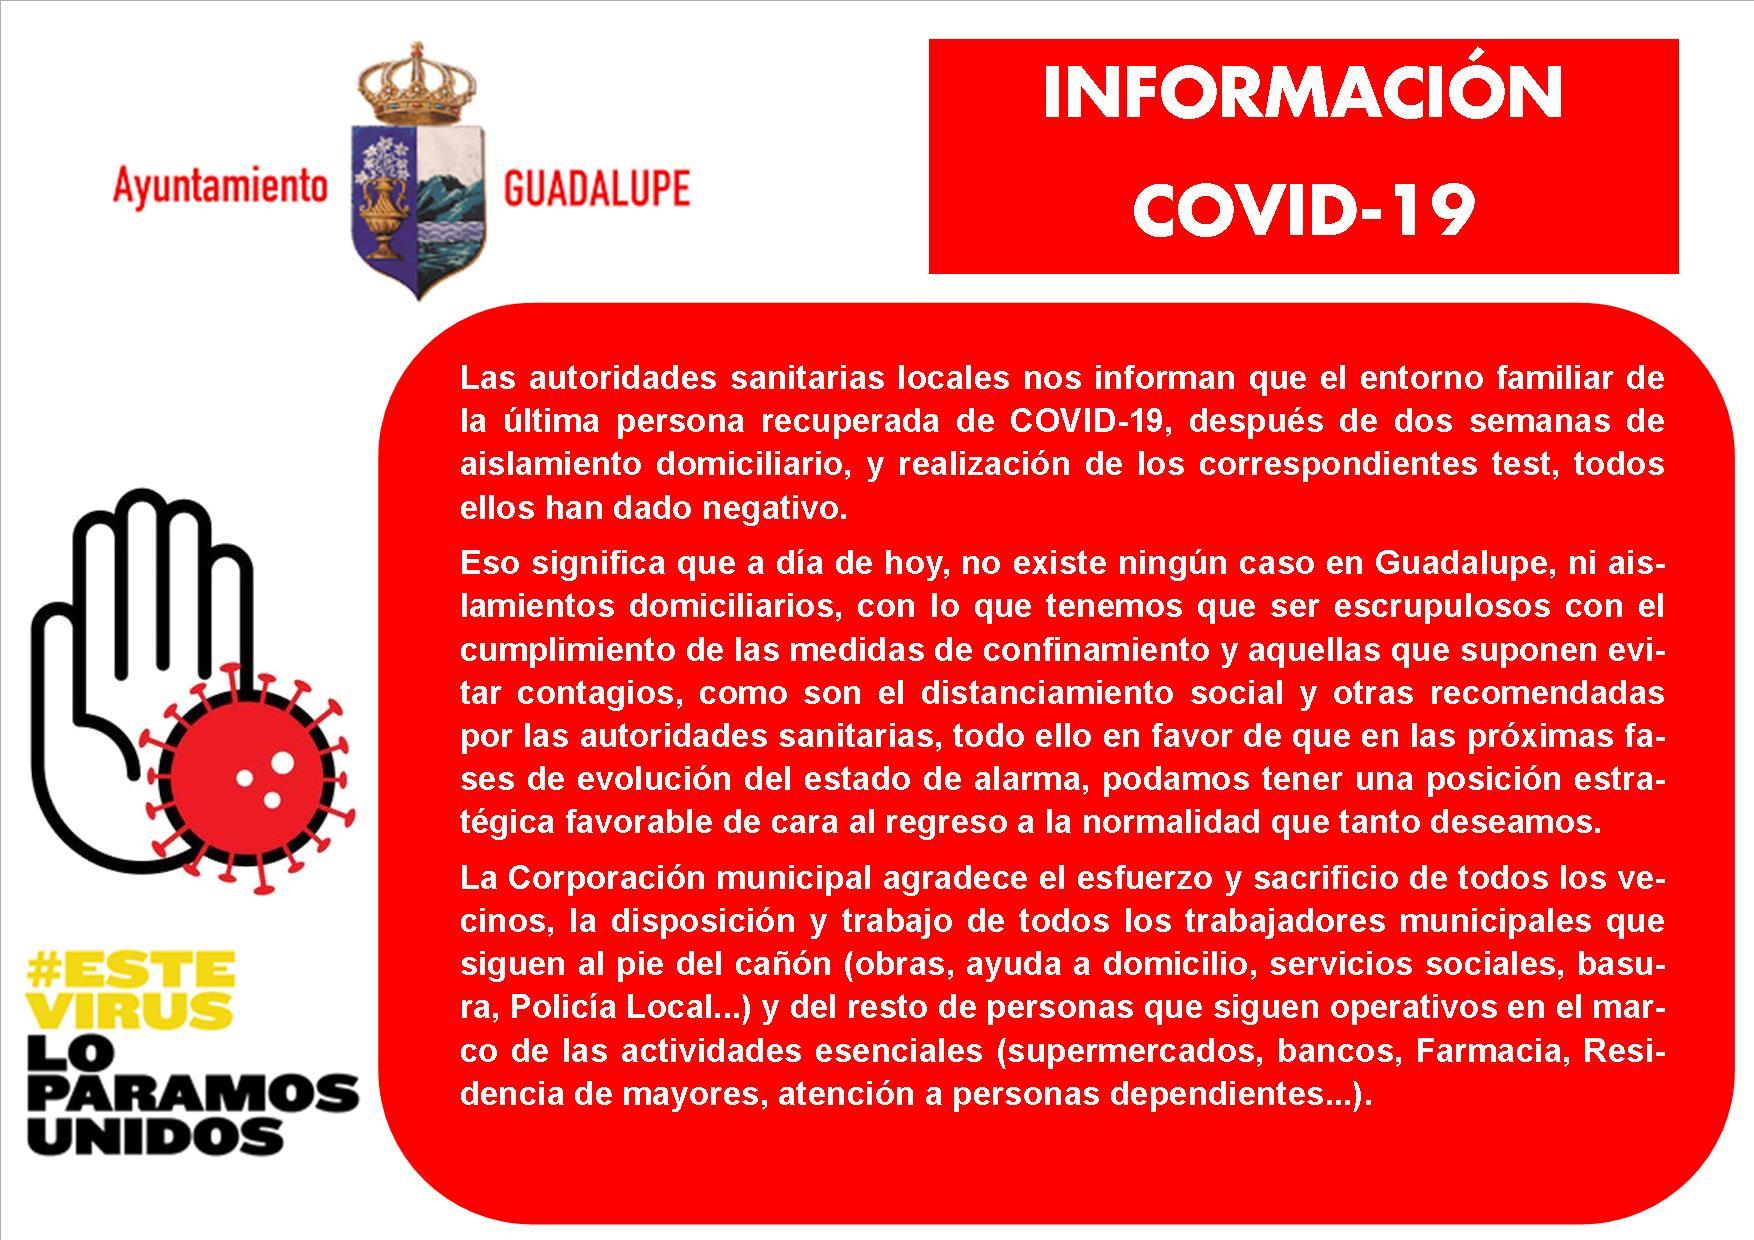 La familia del segundo recuperado por coronavirus dan negativo 2020 - Guadalupe (Cáceres)